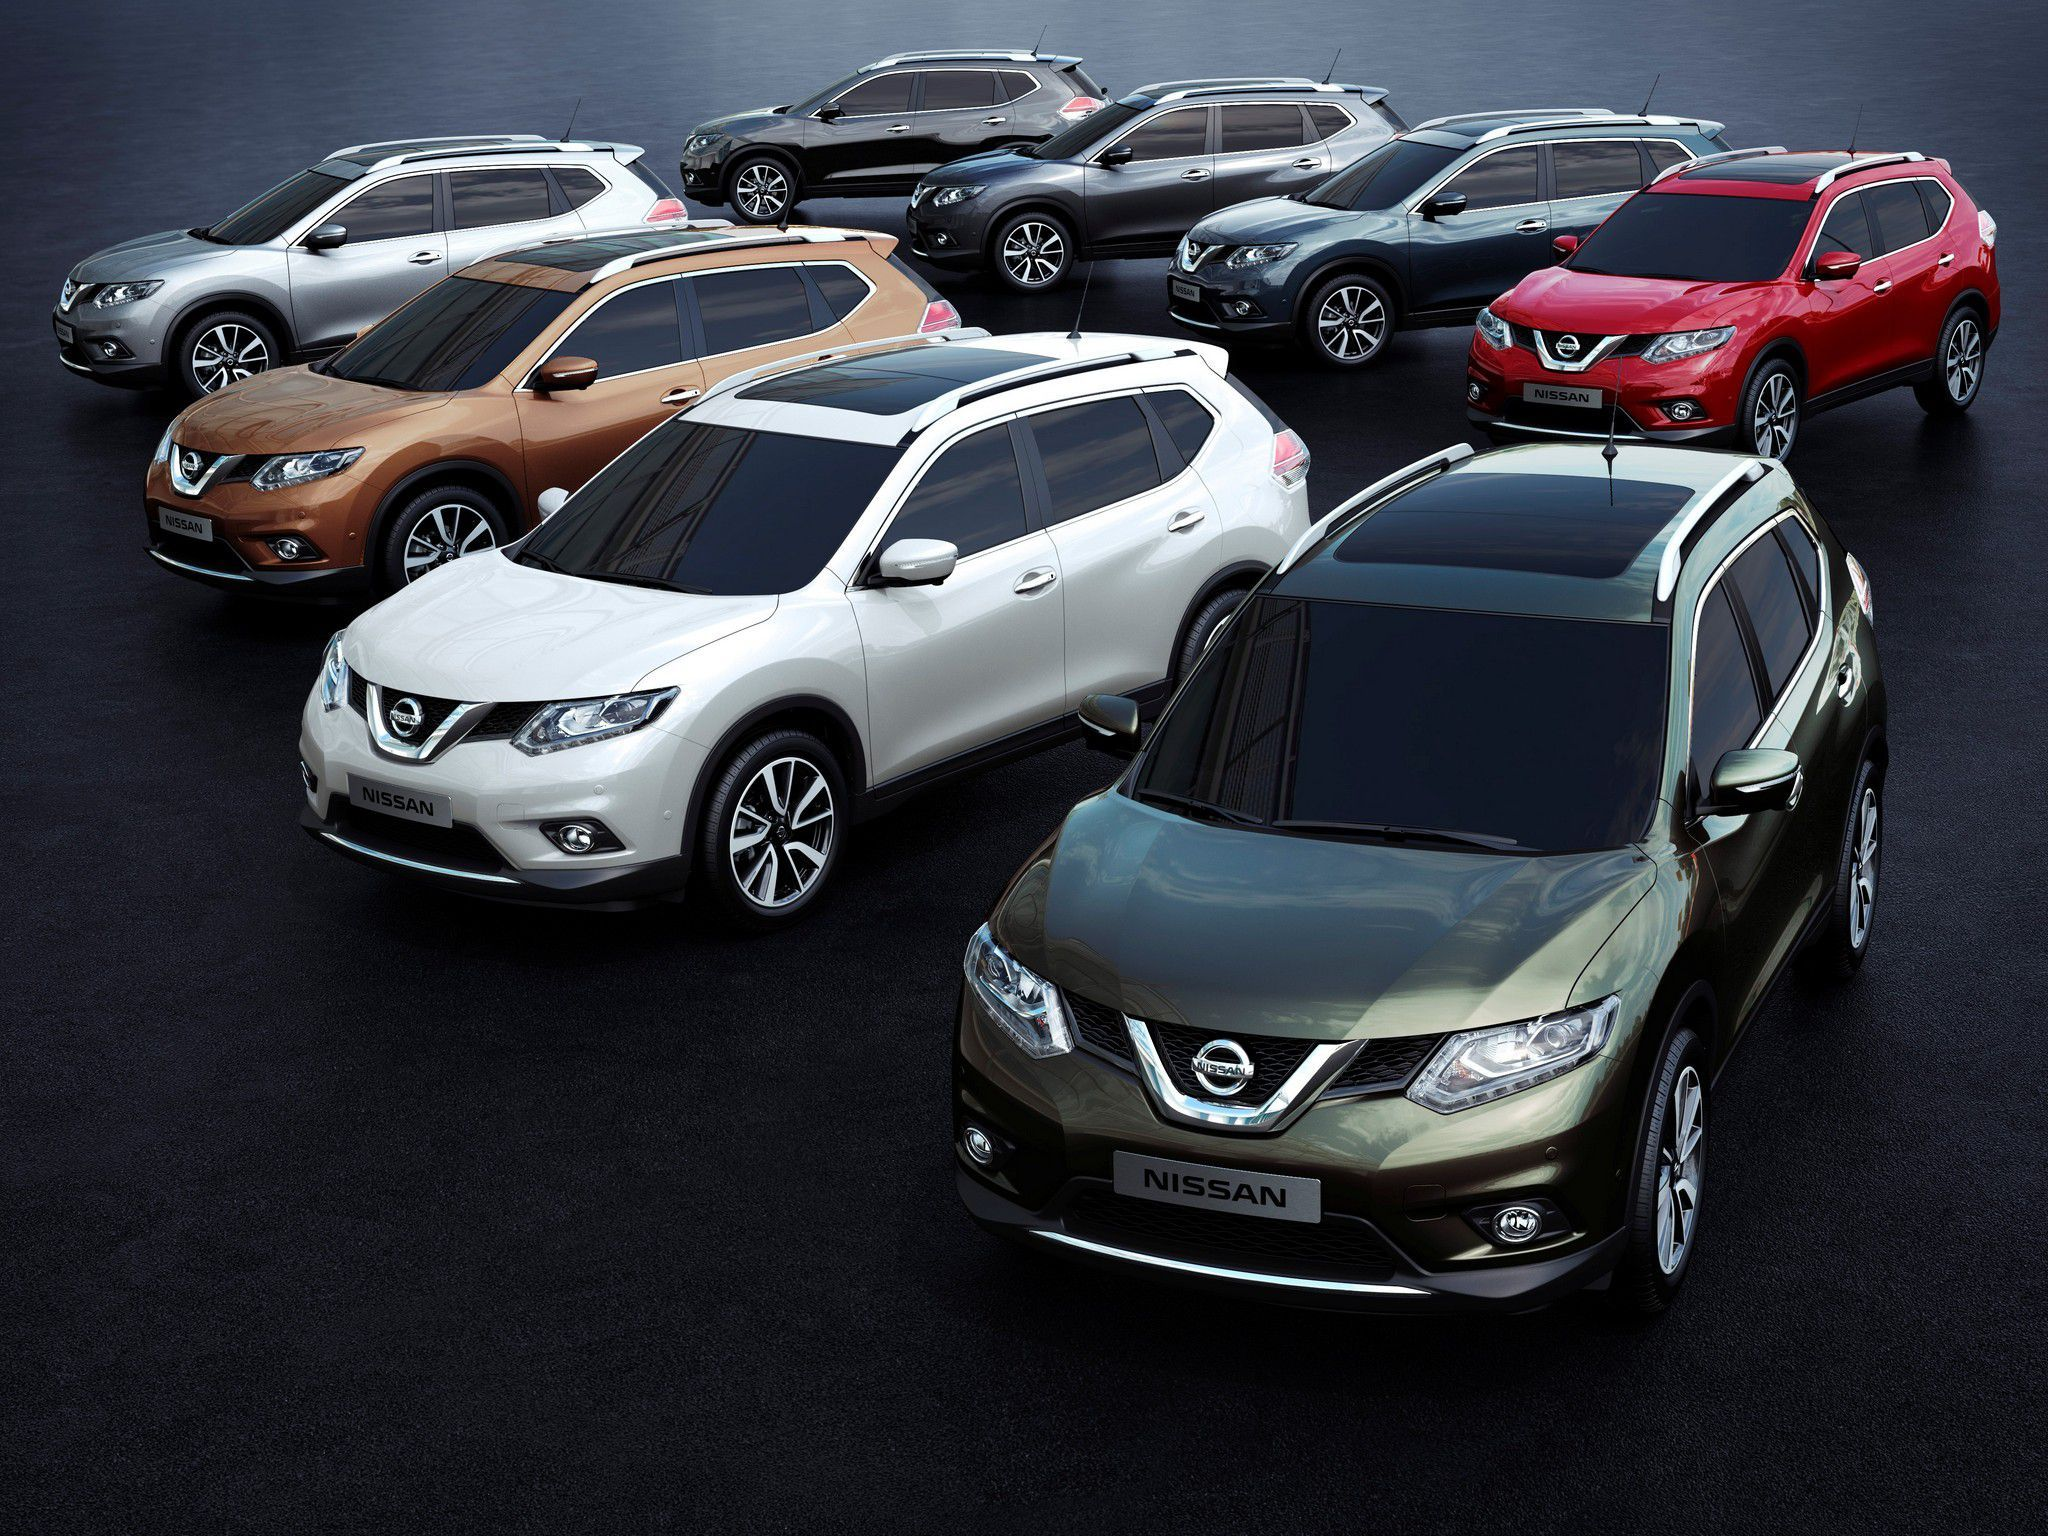 2014 Nissan X Trail Carwallpapers Hu Hatterkep Nissan Xtrail Nissan Car